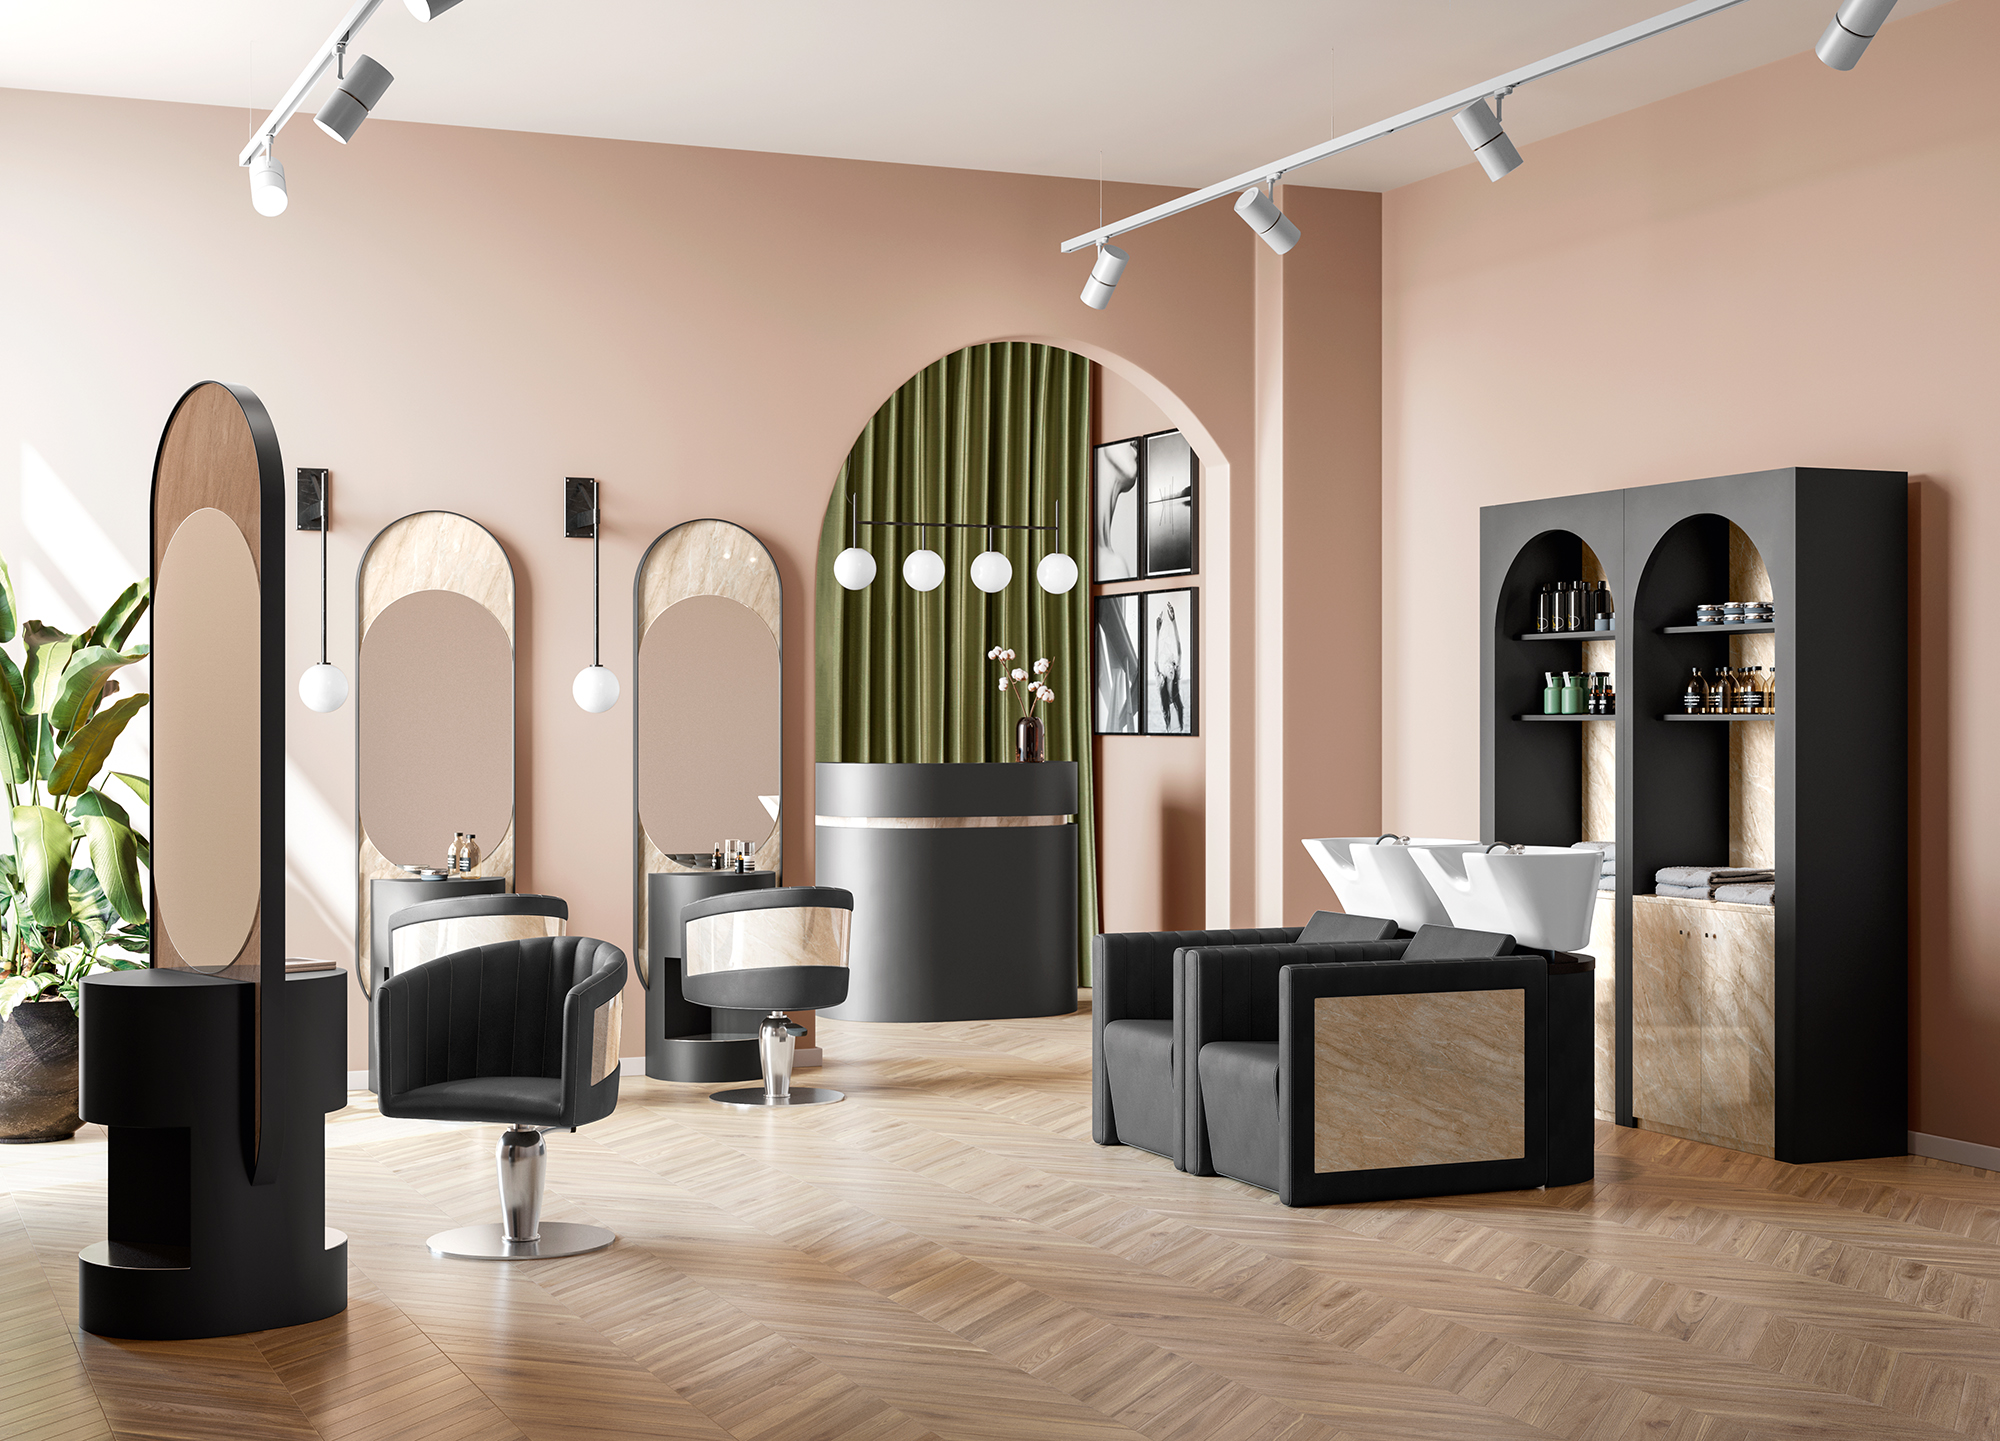 Allure Salon Furnishing Line by Vezzosi